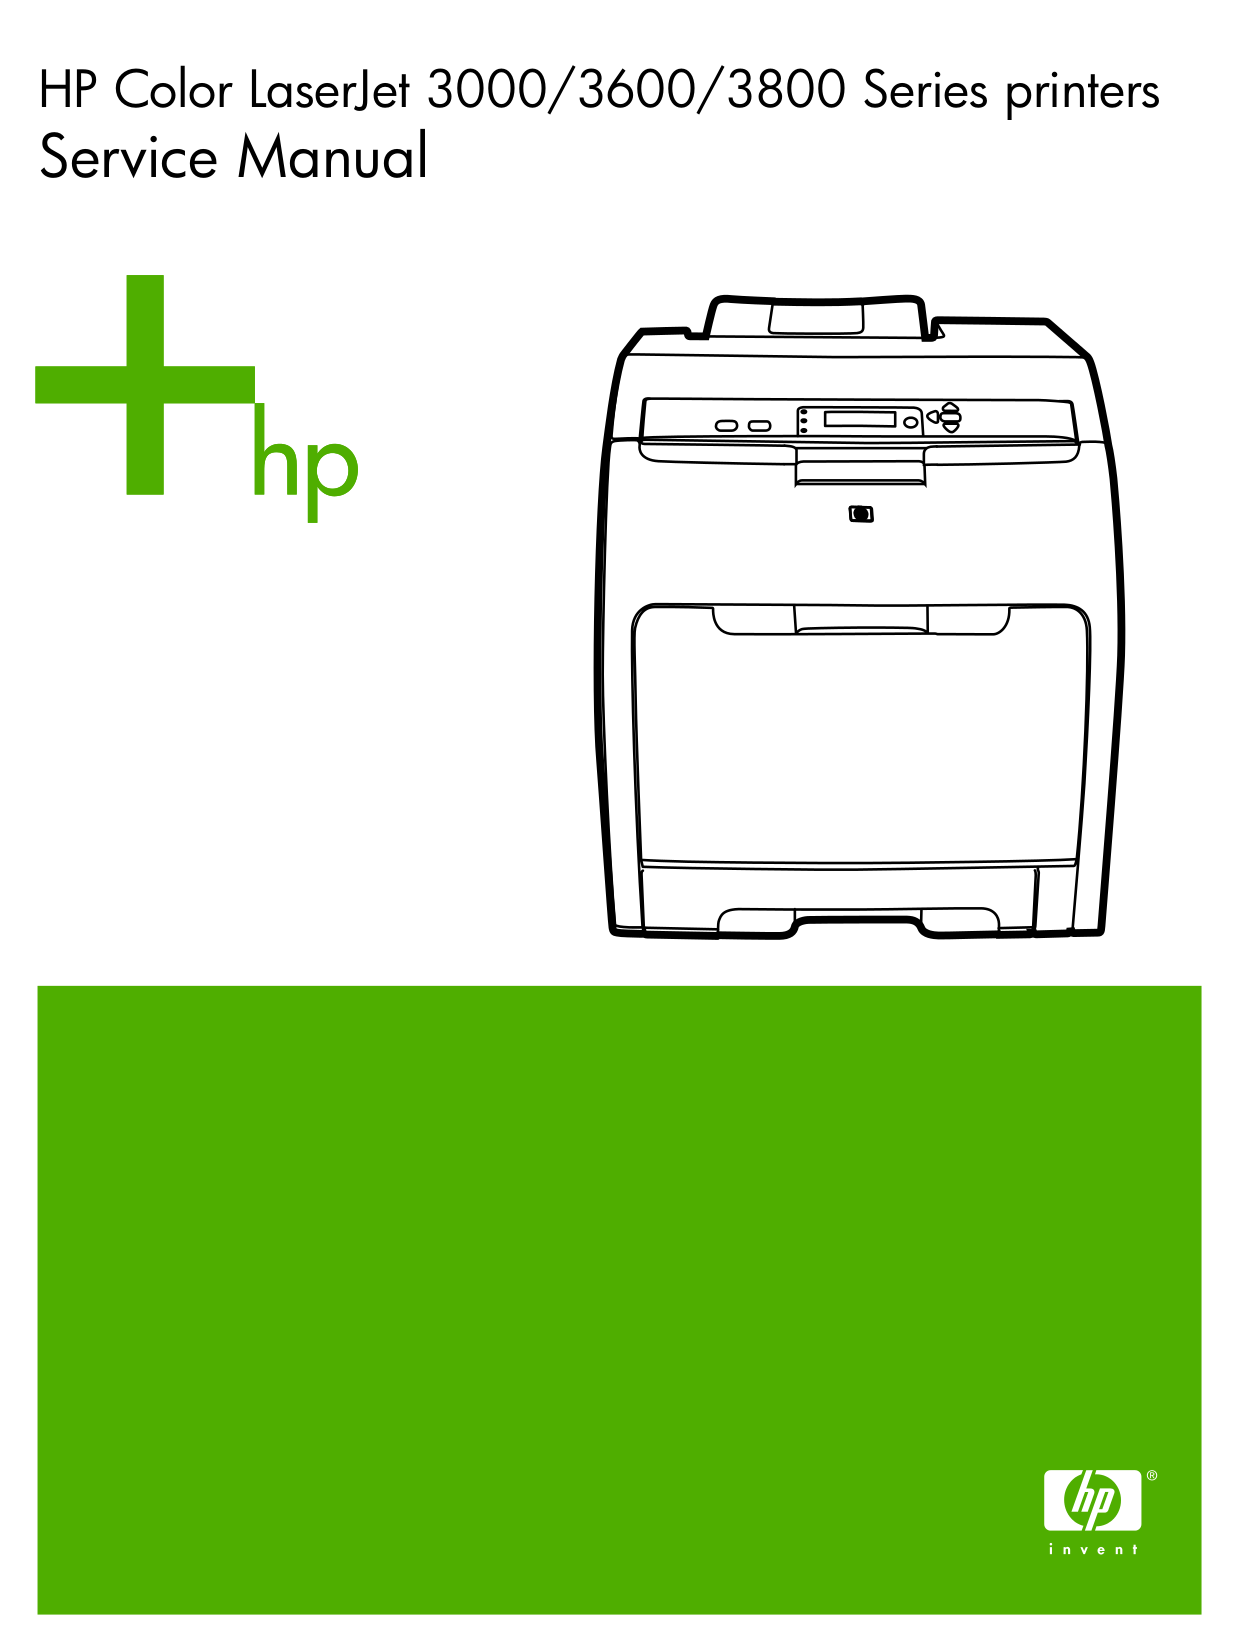 pdf for HP Printer Laserjet,Color Laserjet IIIP manual